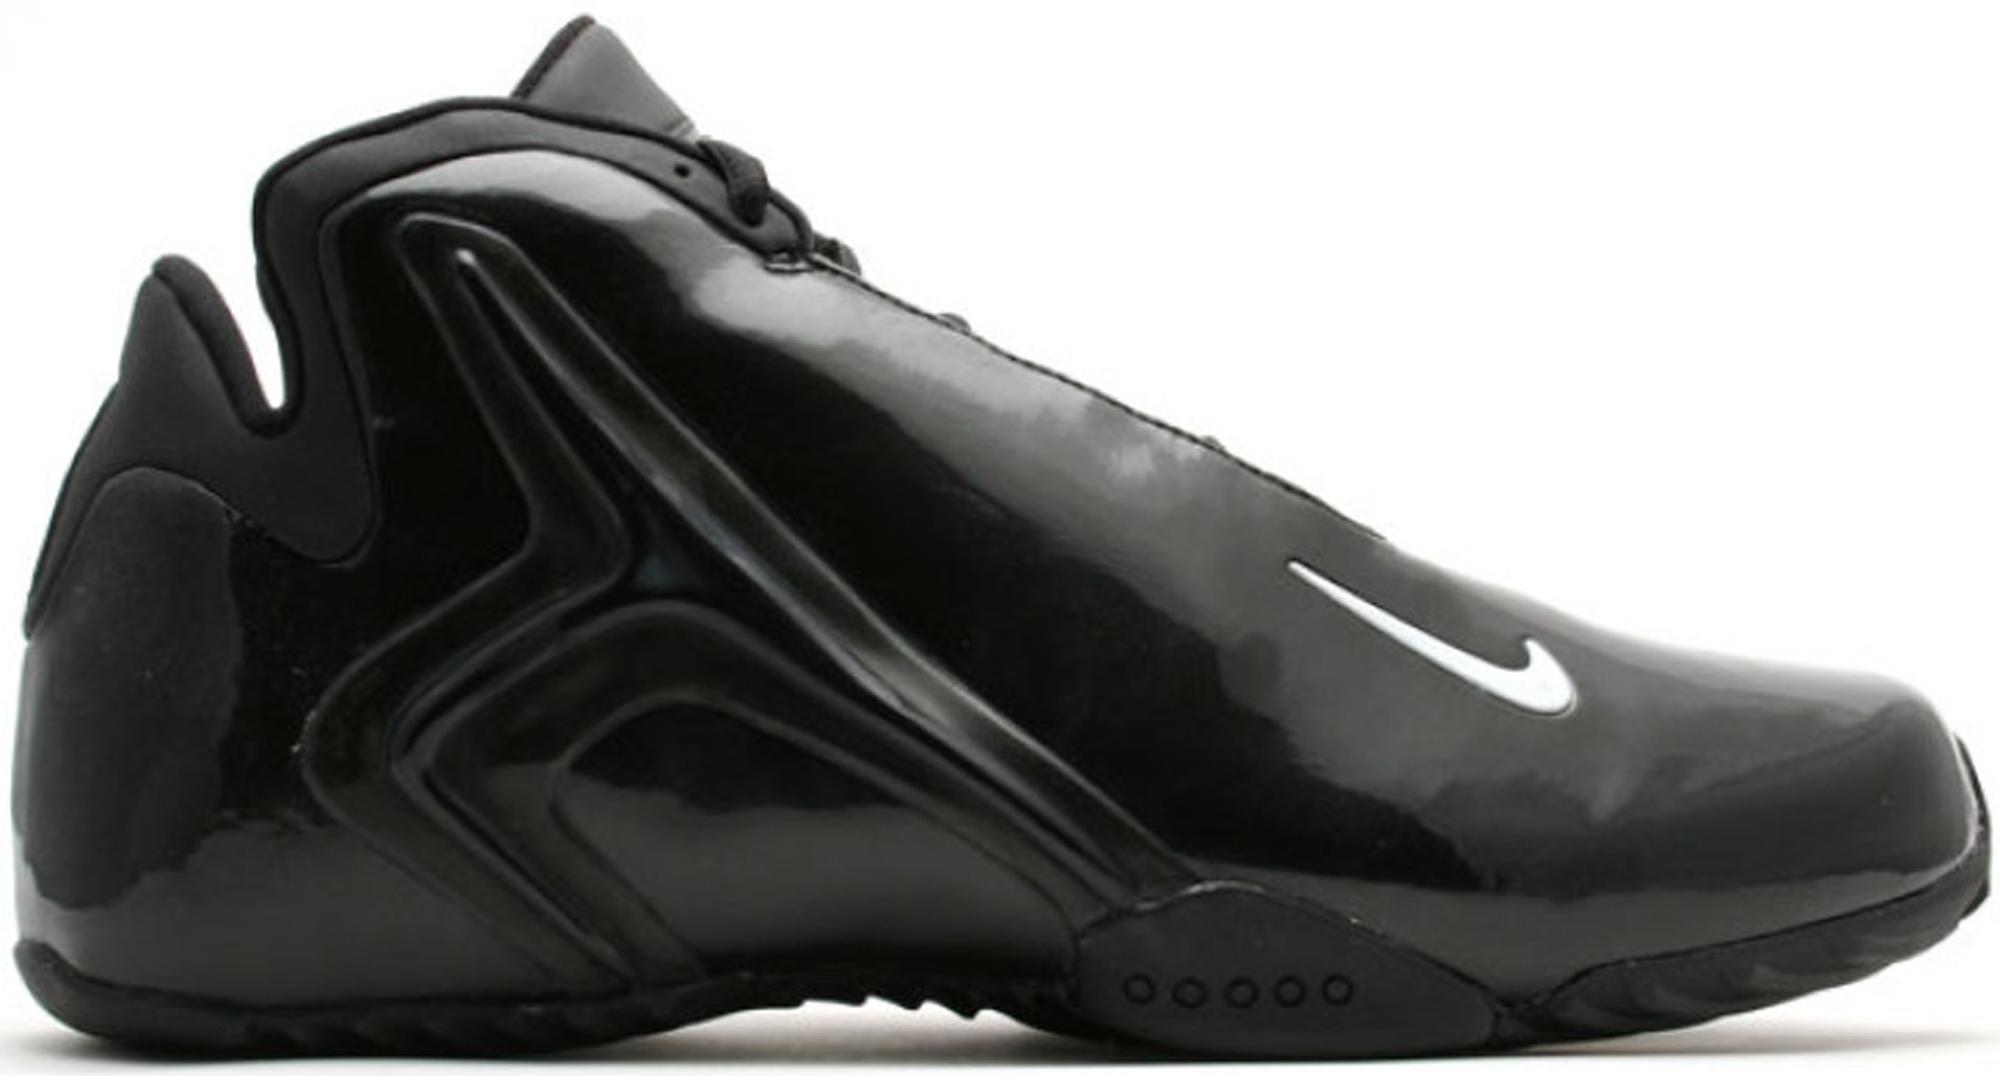 Nike Air Hyperflight Black White